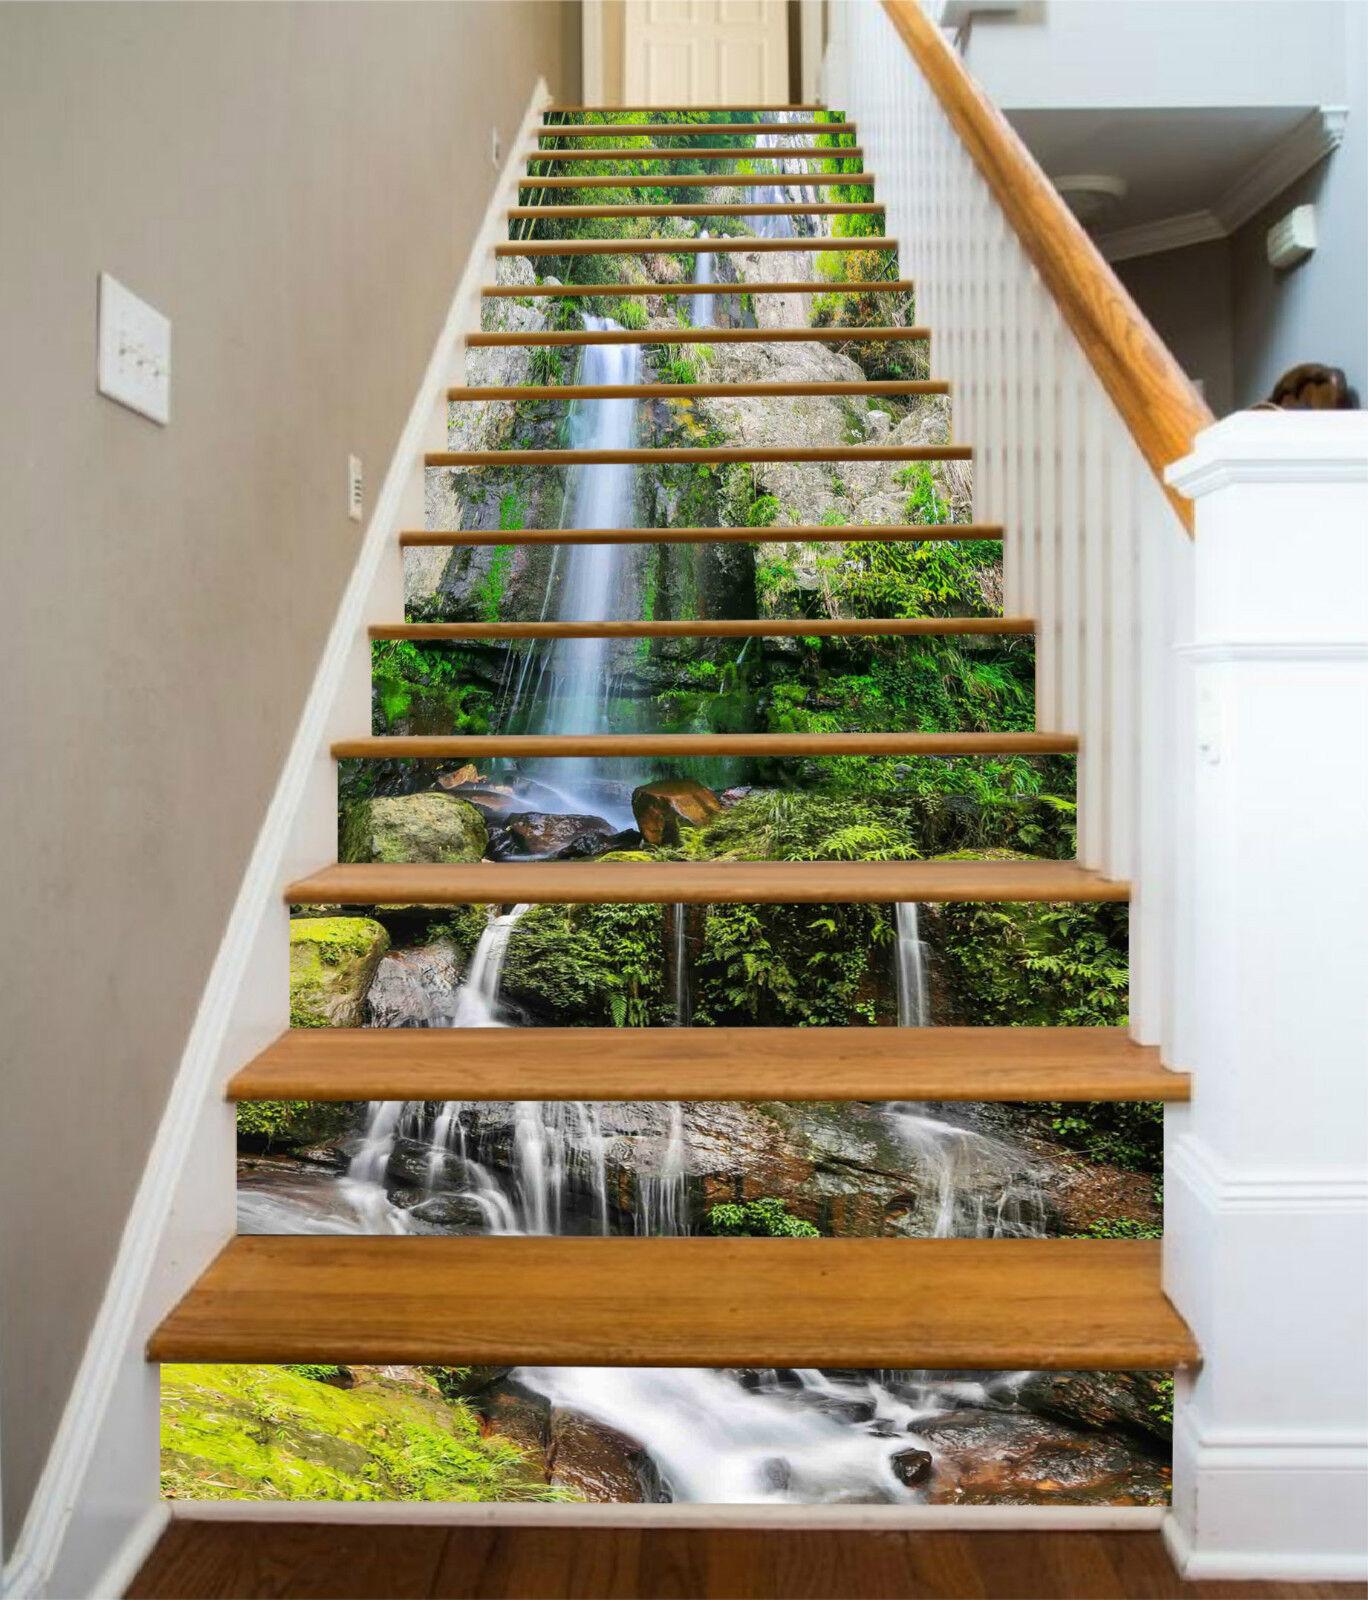 3D Lang Wasserfall 5Stair Risers Dekoration Fototapete Vinyl Aufkleber Tapete DE